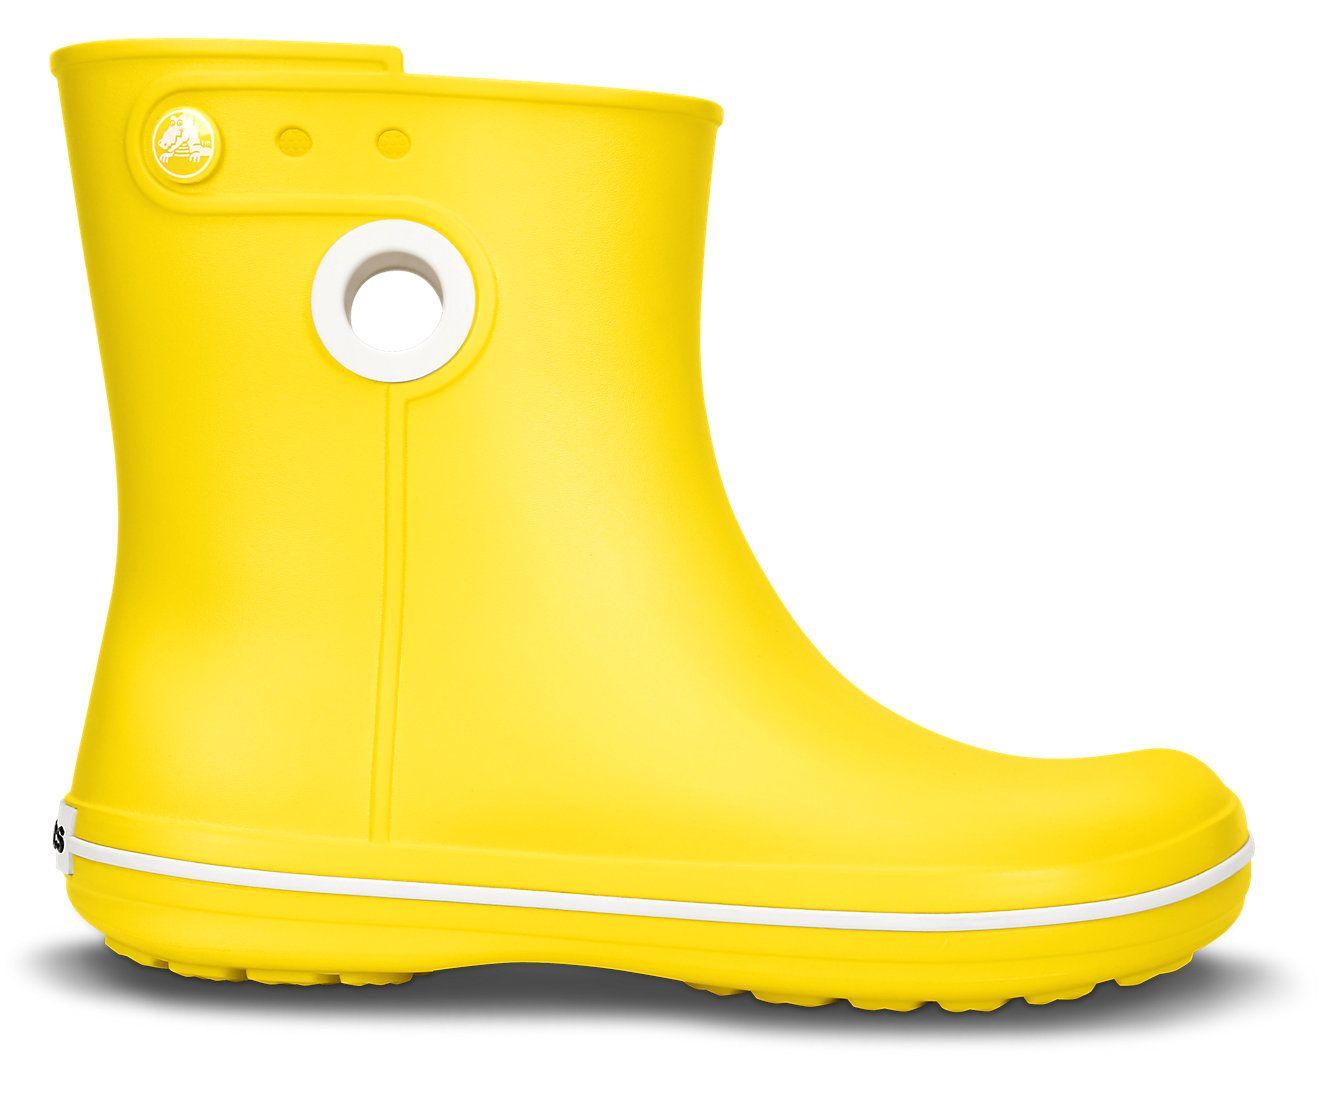 Crocs Women's Jaunt Shorty Boot | Women's Comfortable Flats | Crocs Official Site. Koko 38-39. 39,95 €. Myös muut värit käy.